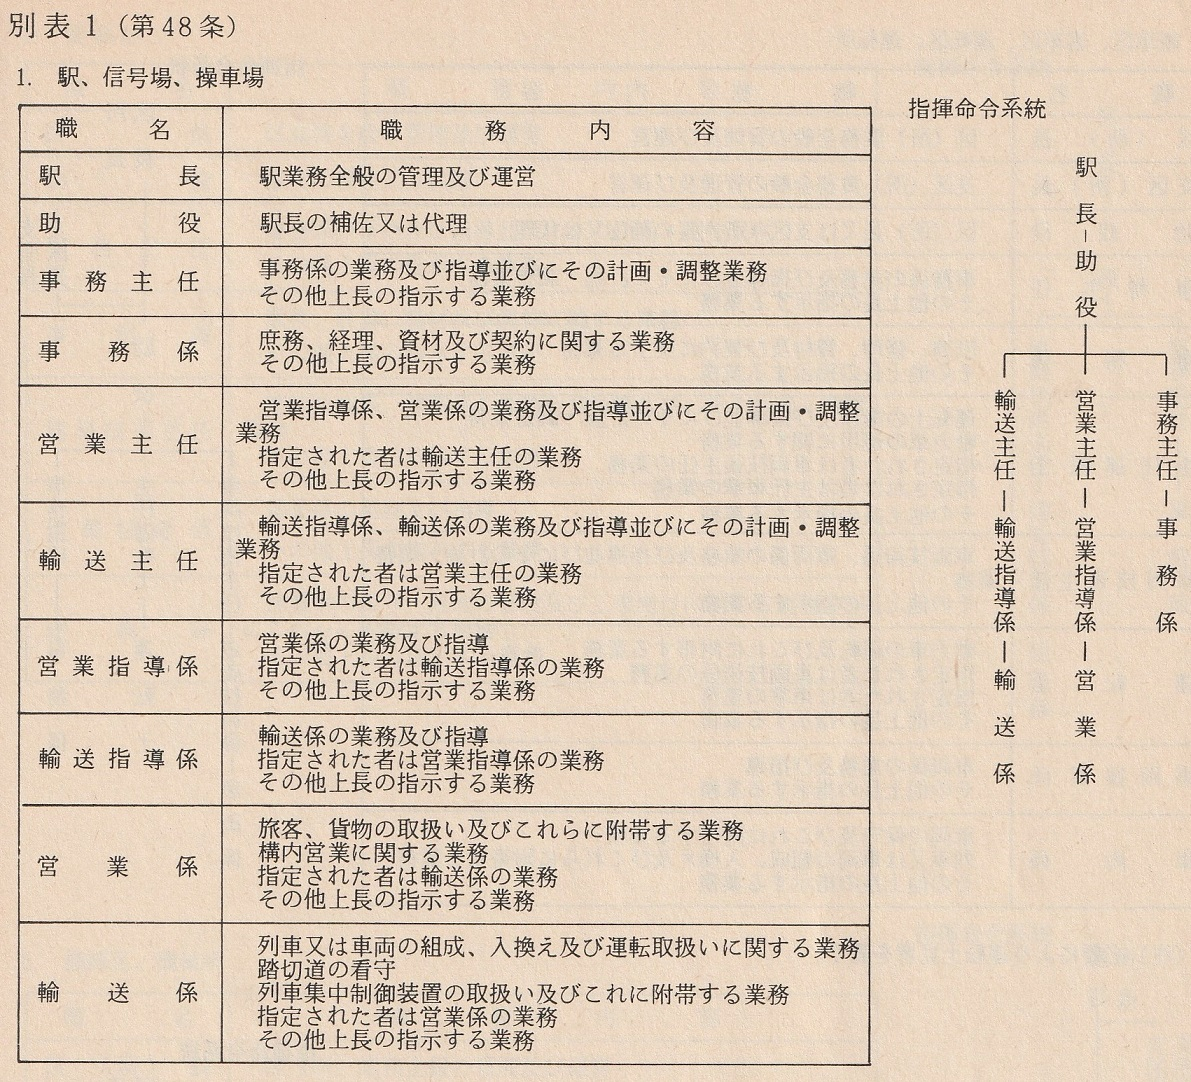 JR初期の駅員職制